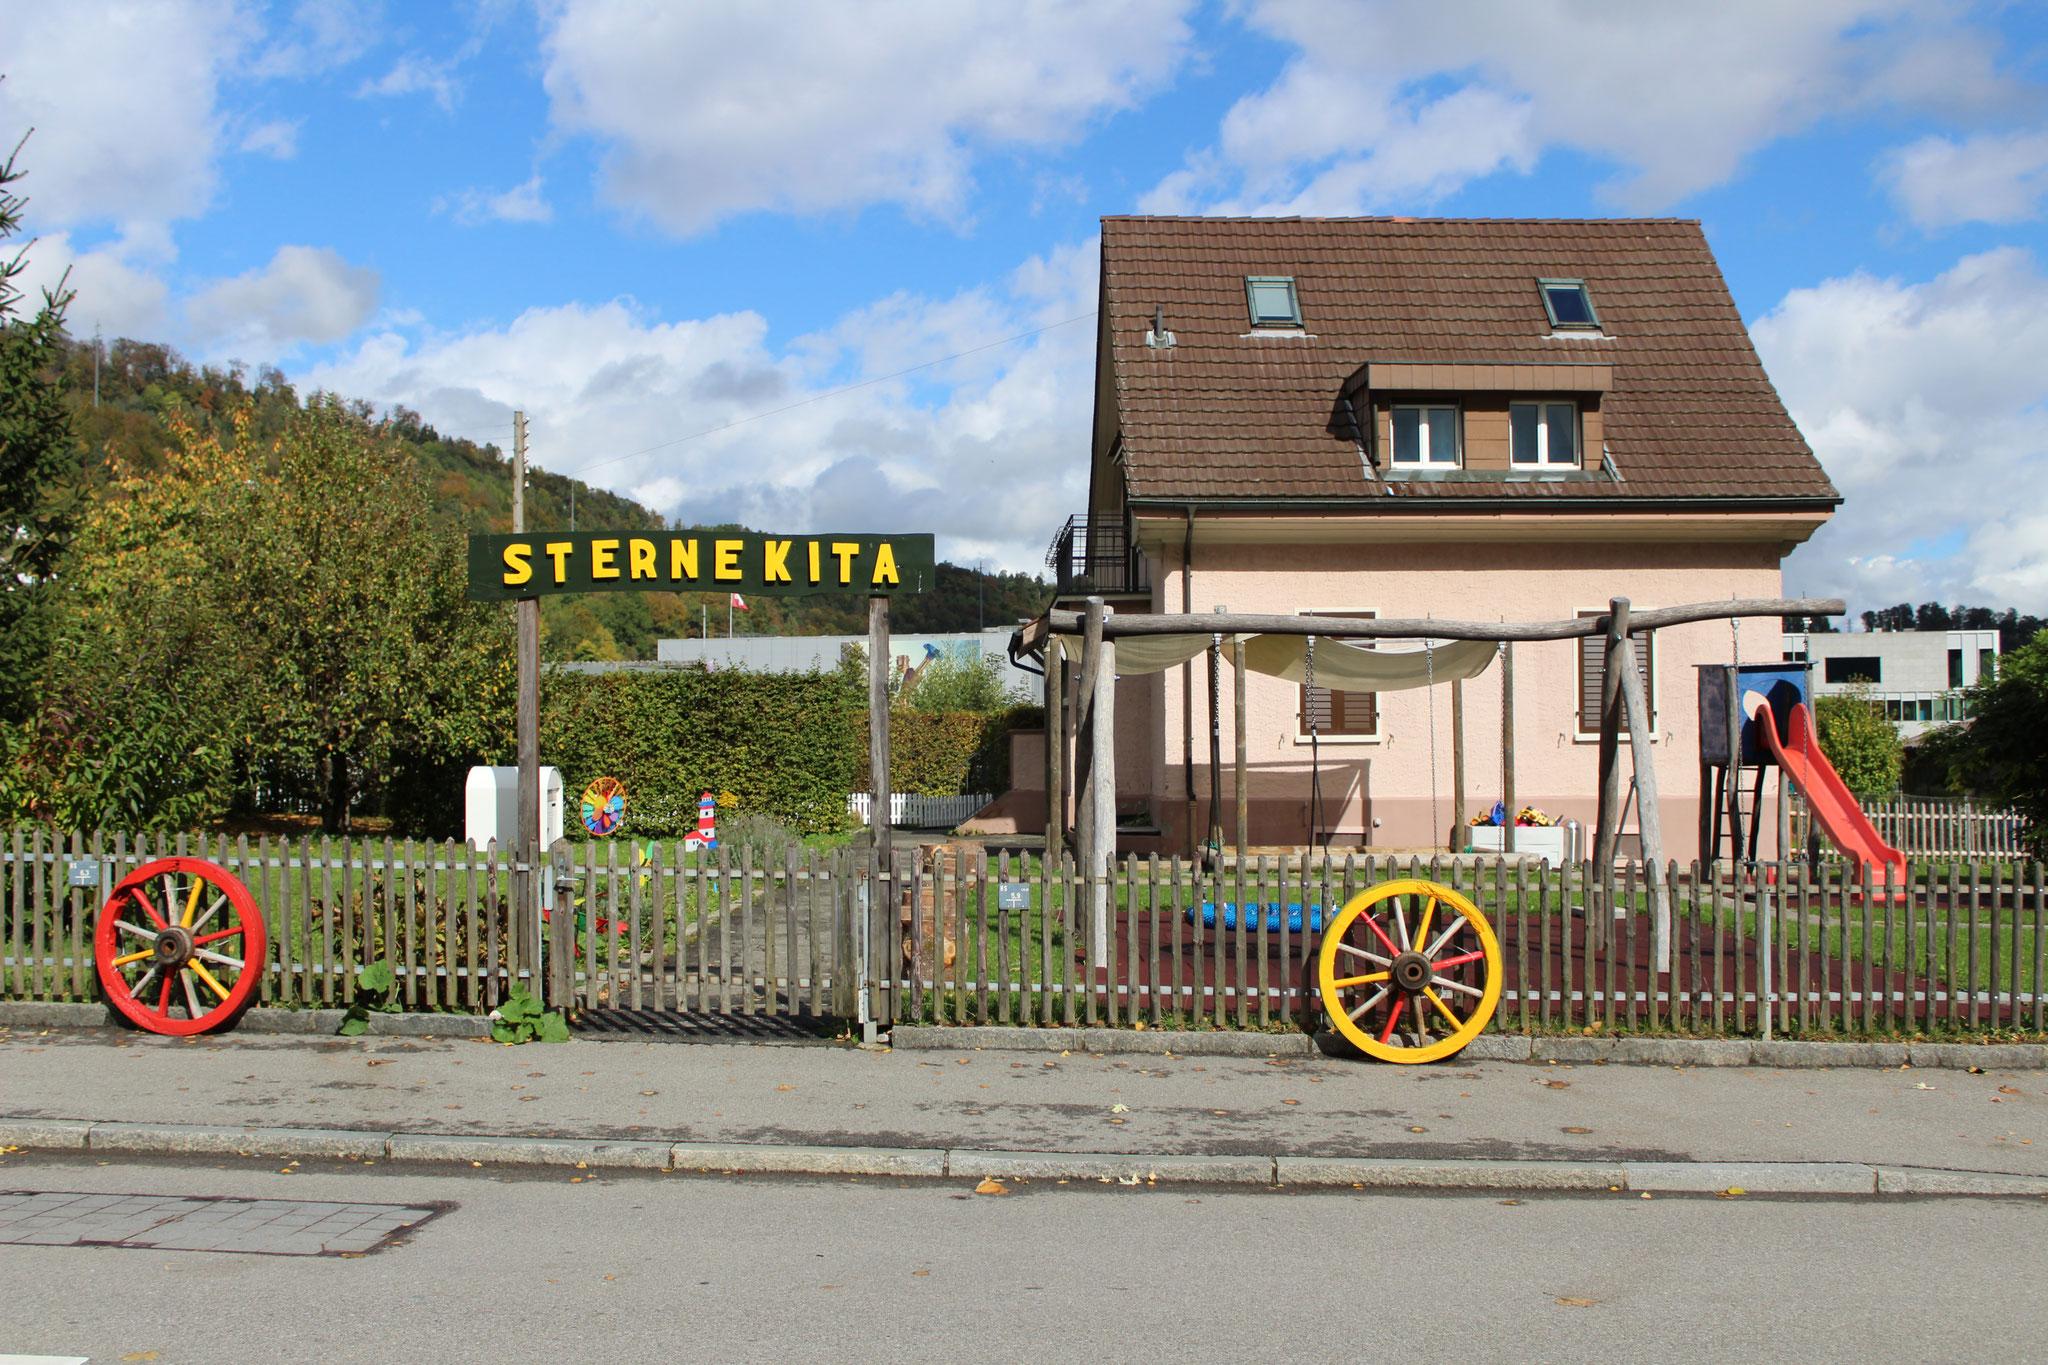 Sternekita Trimbach